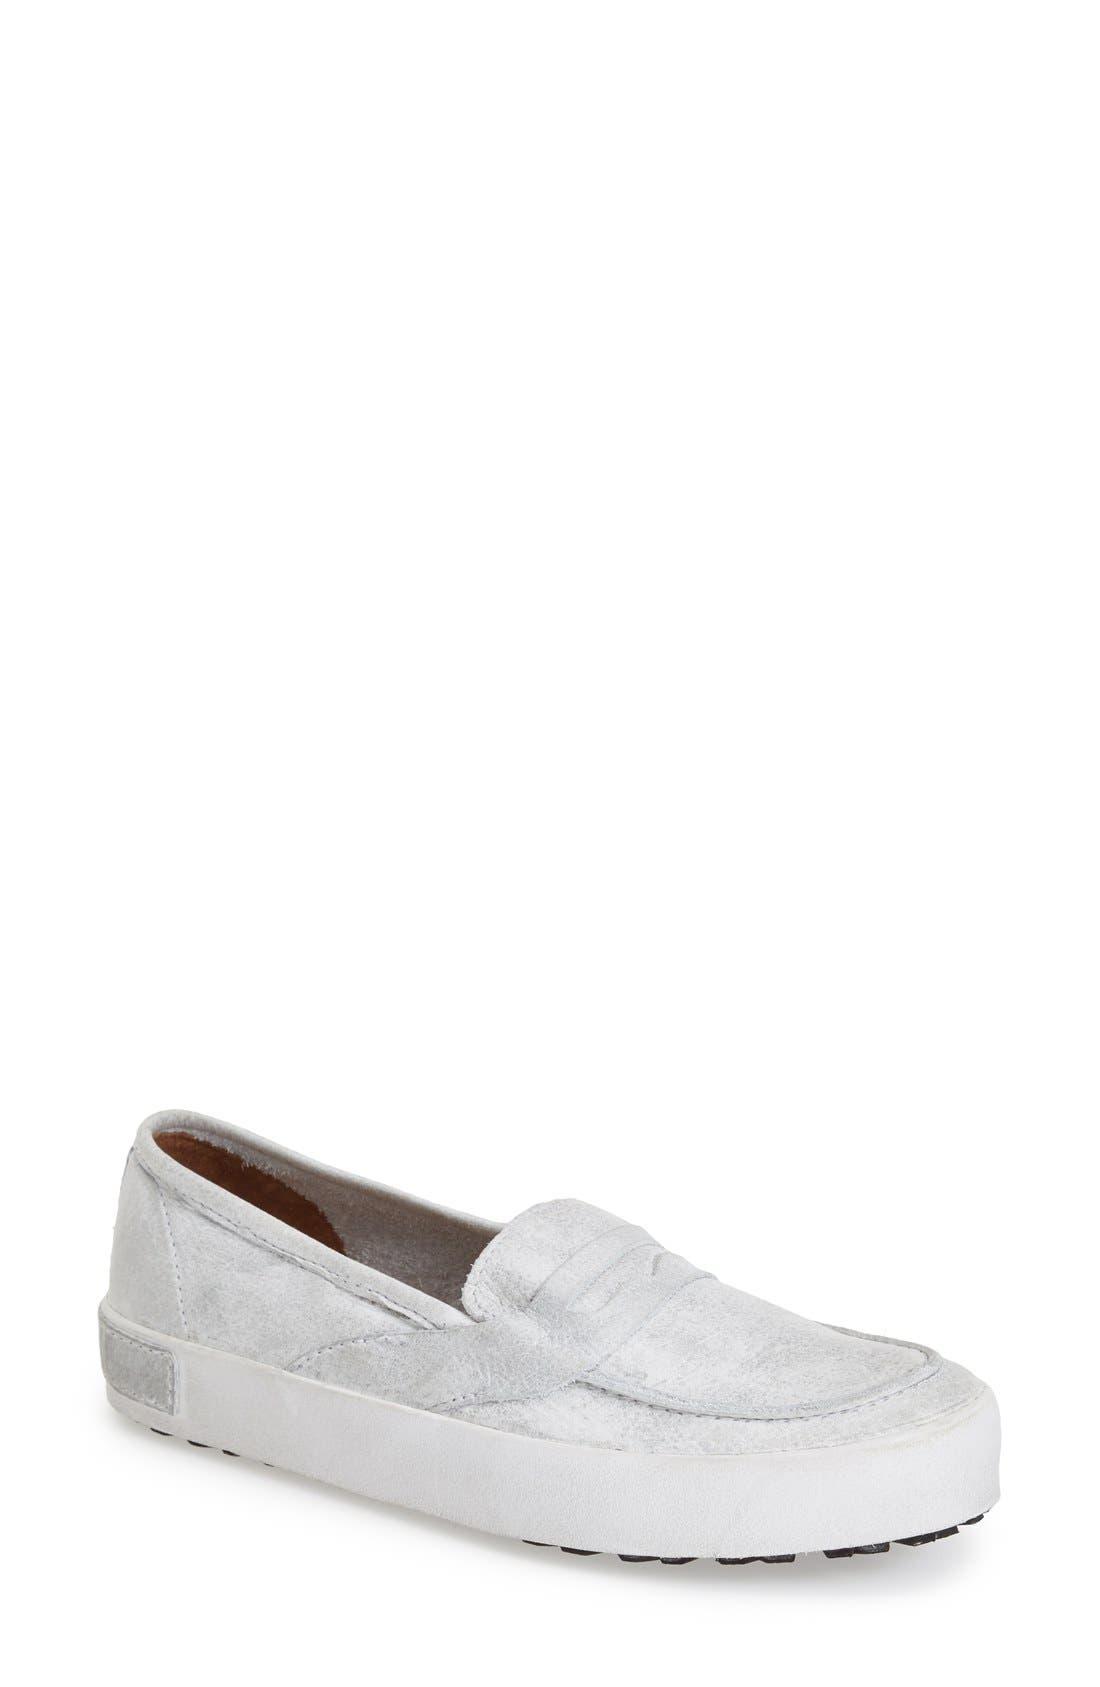 Main Image - Blackstone 'JL23' Slip-On Sneaker (Women)